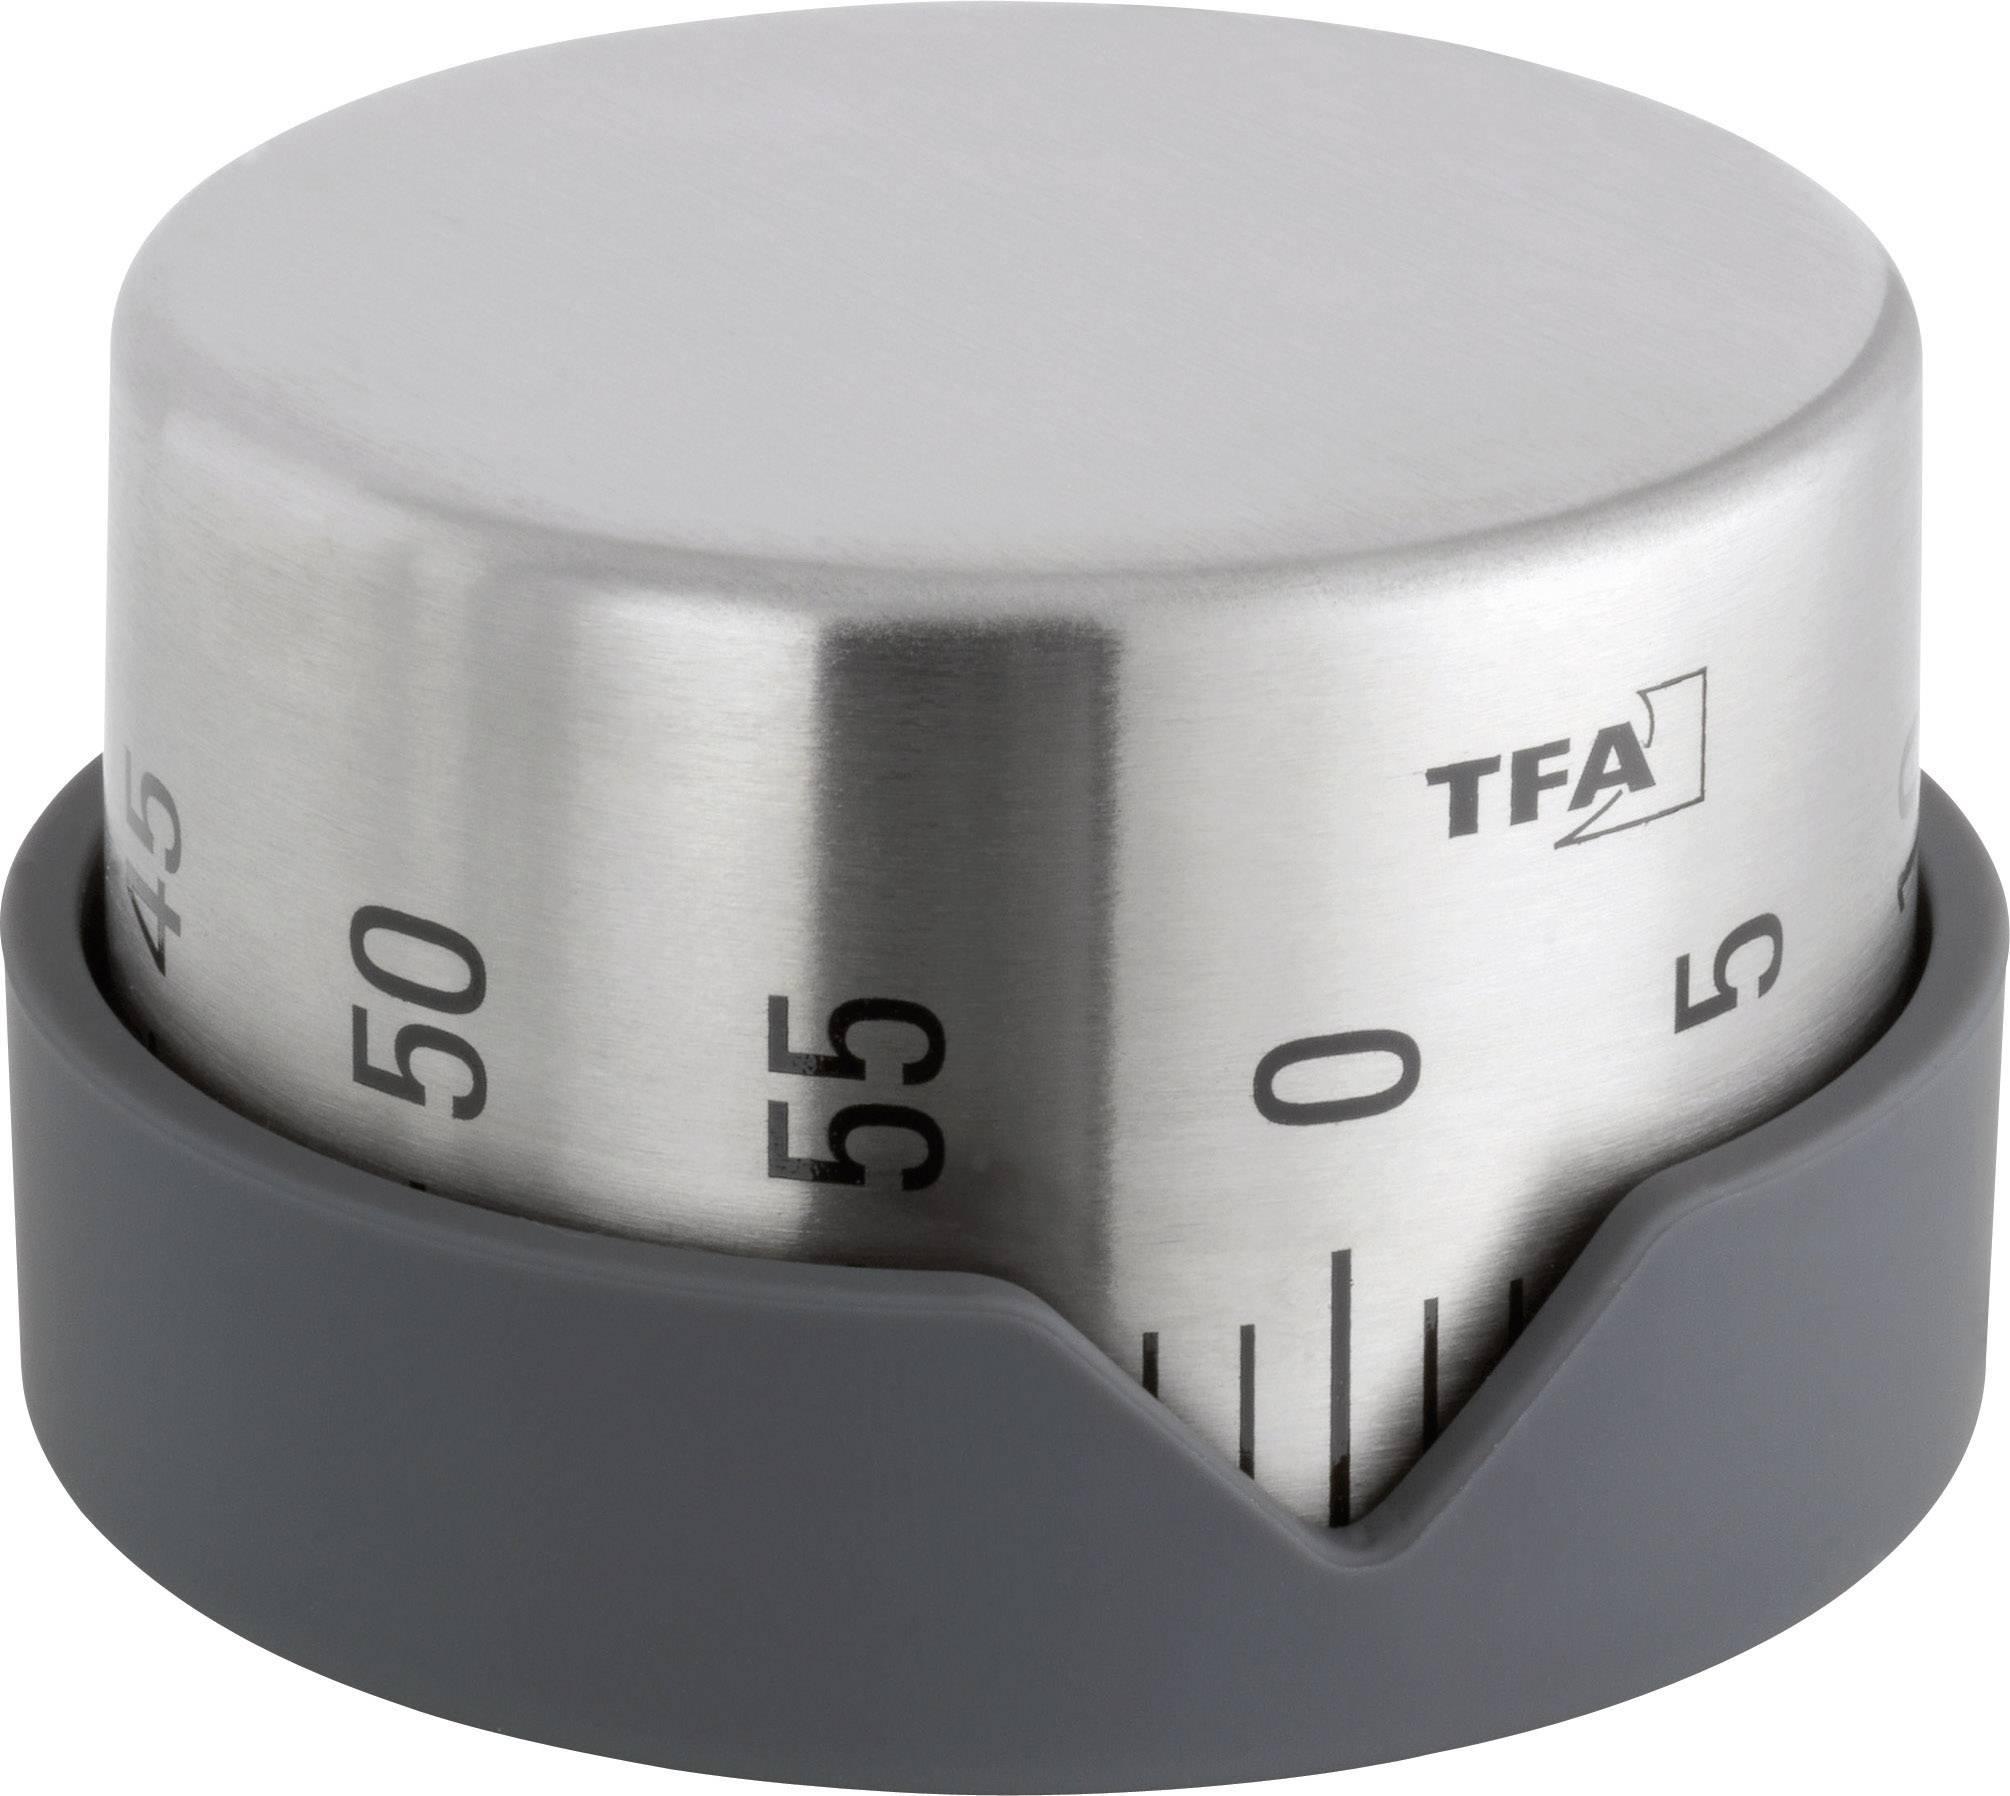 Kuchyňská minutka TFA, 38.1027.10, 70 x 43 mm